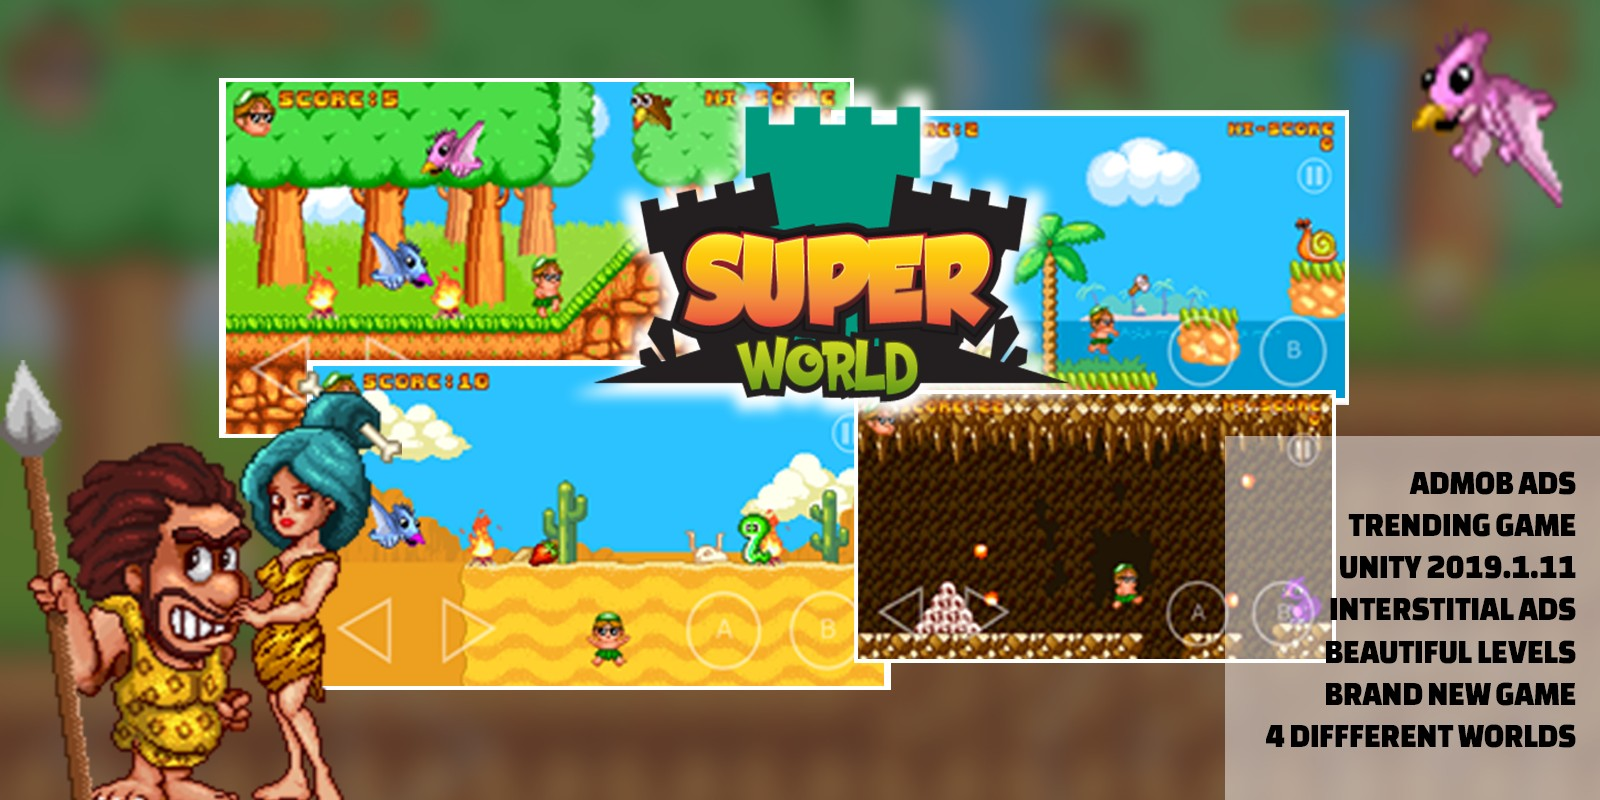 Super World - Unity Source Code